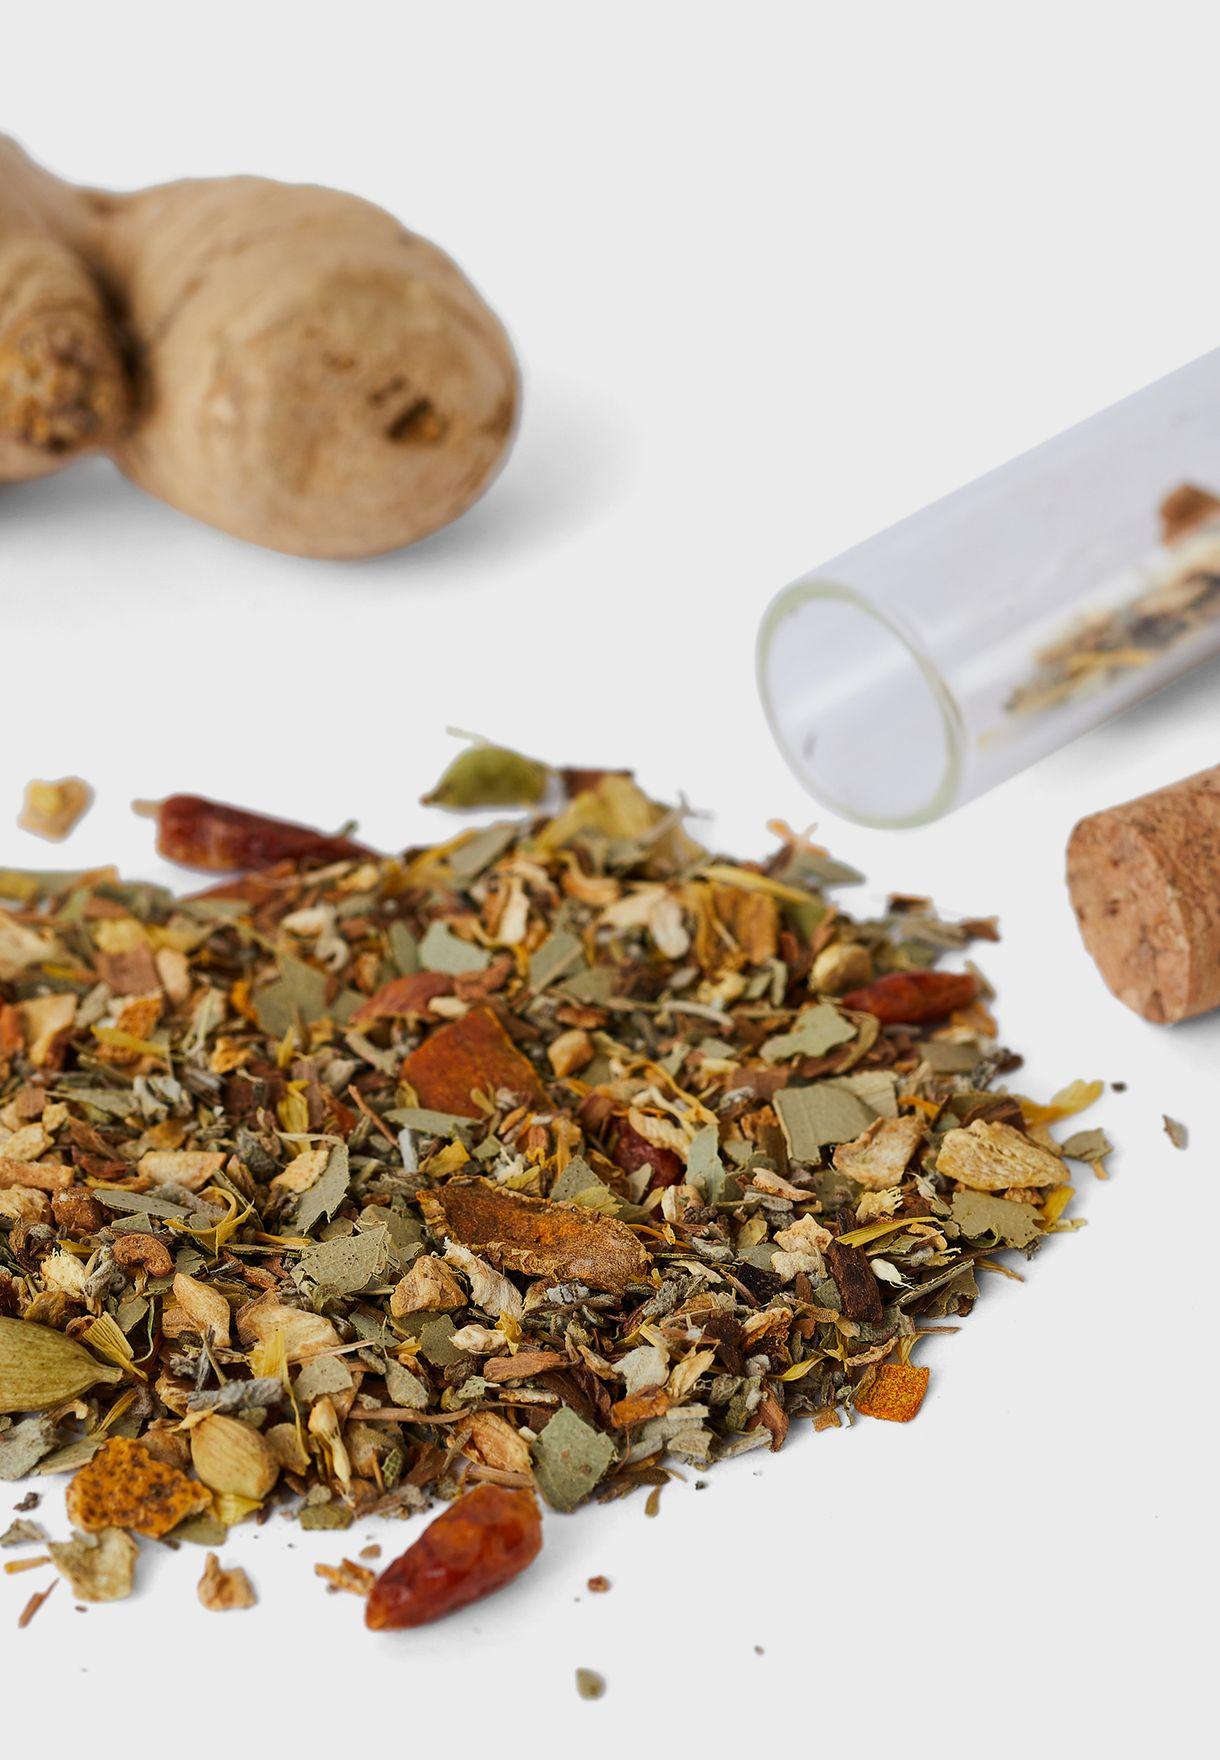 Herb Tea Blend - Organic Simplicity